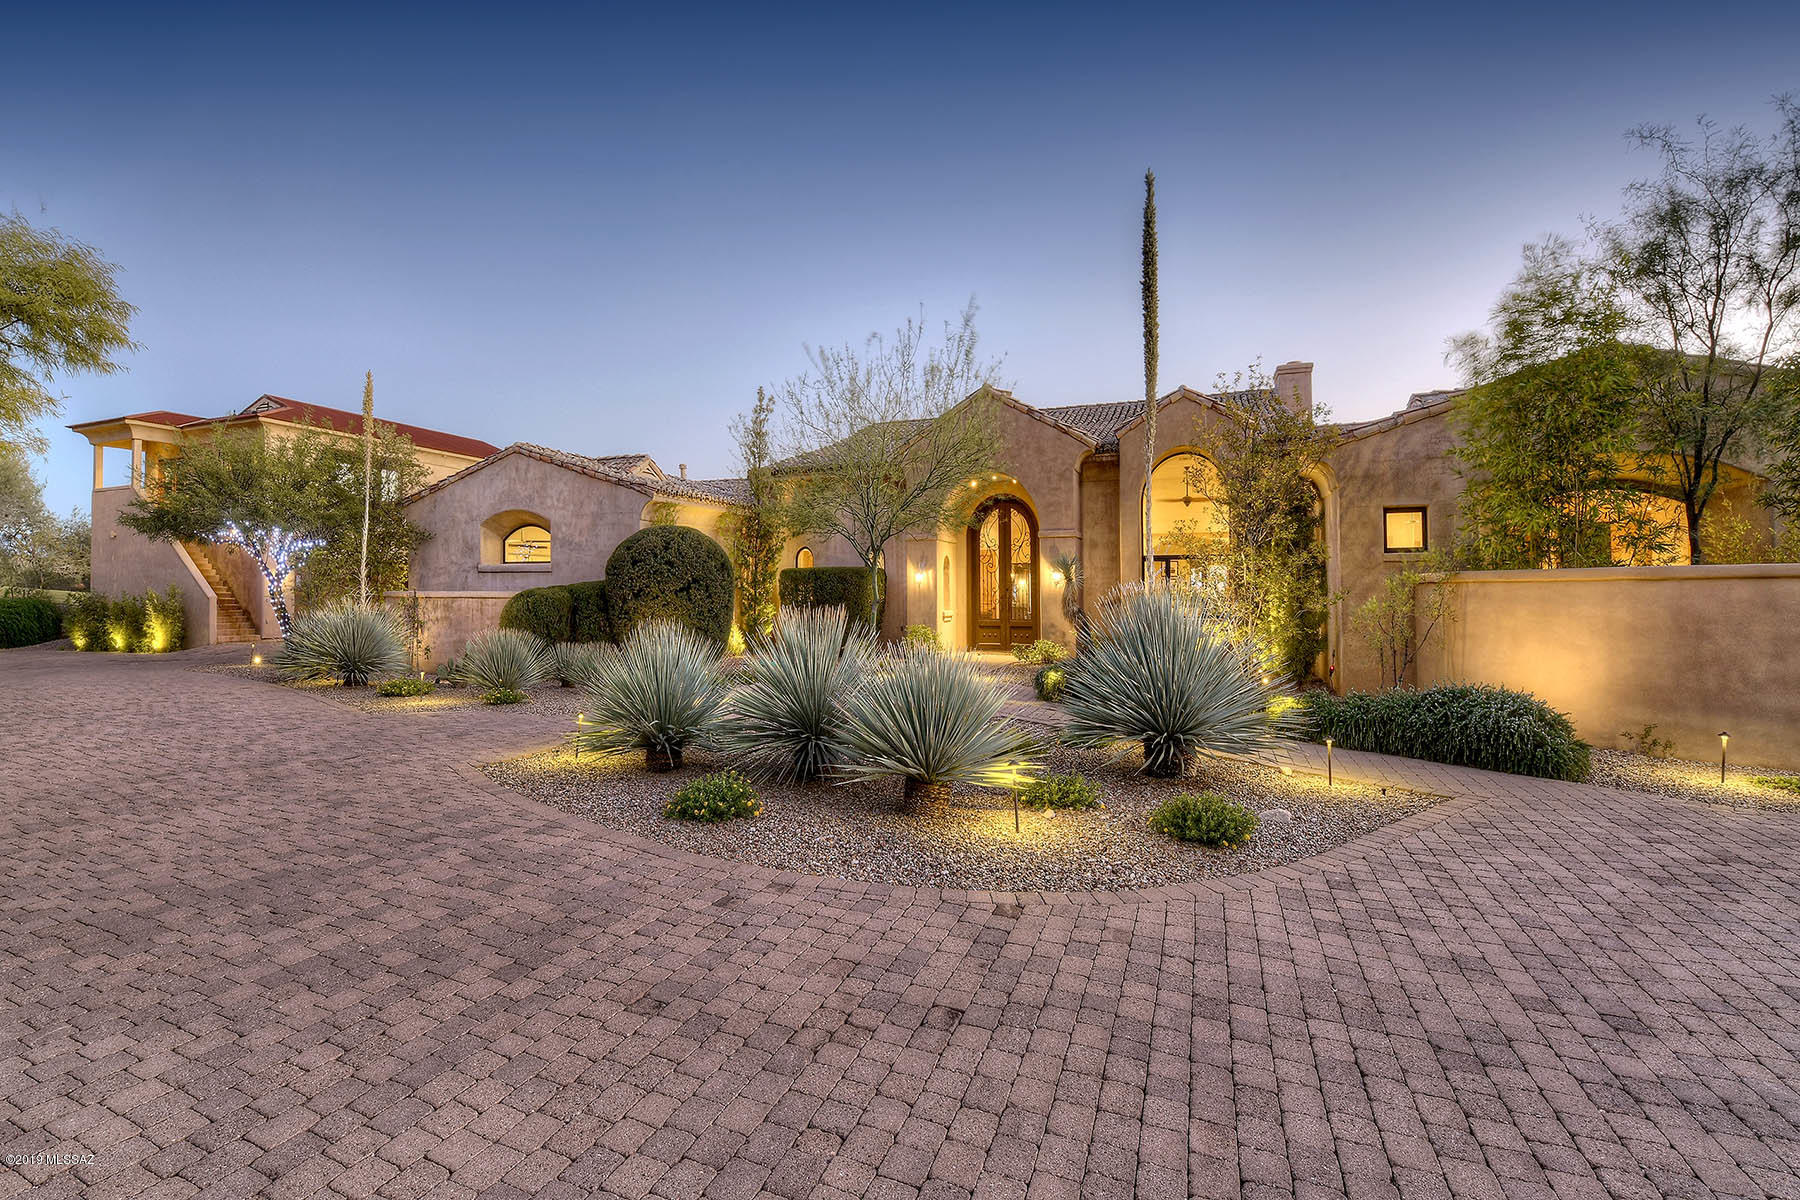 Photo of 4930 E Winged Foot Drive, Tucson, AZ 85718